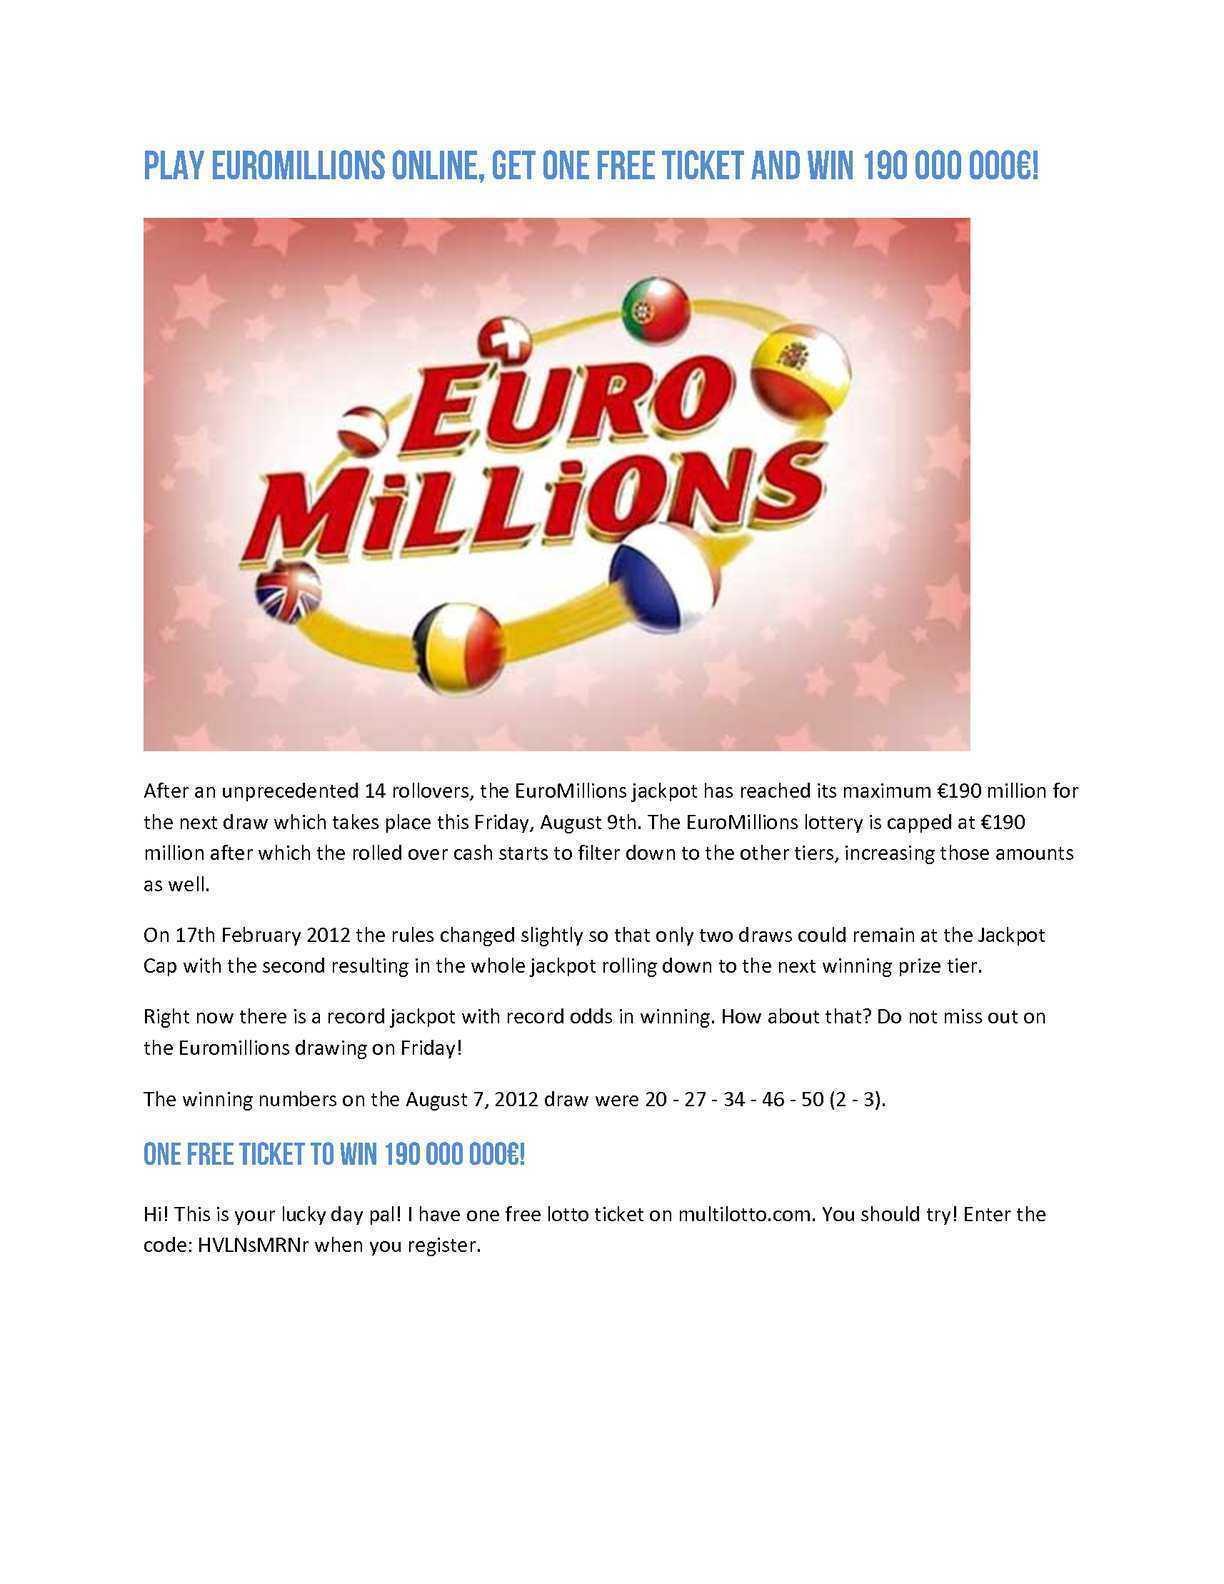 Euromillions raffles